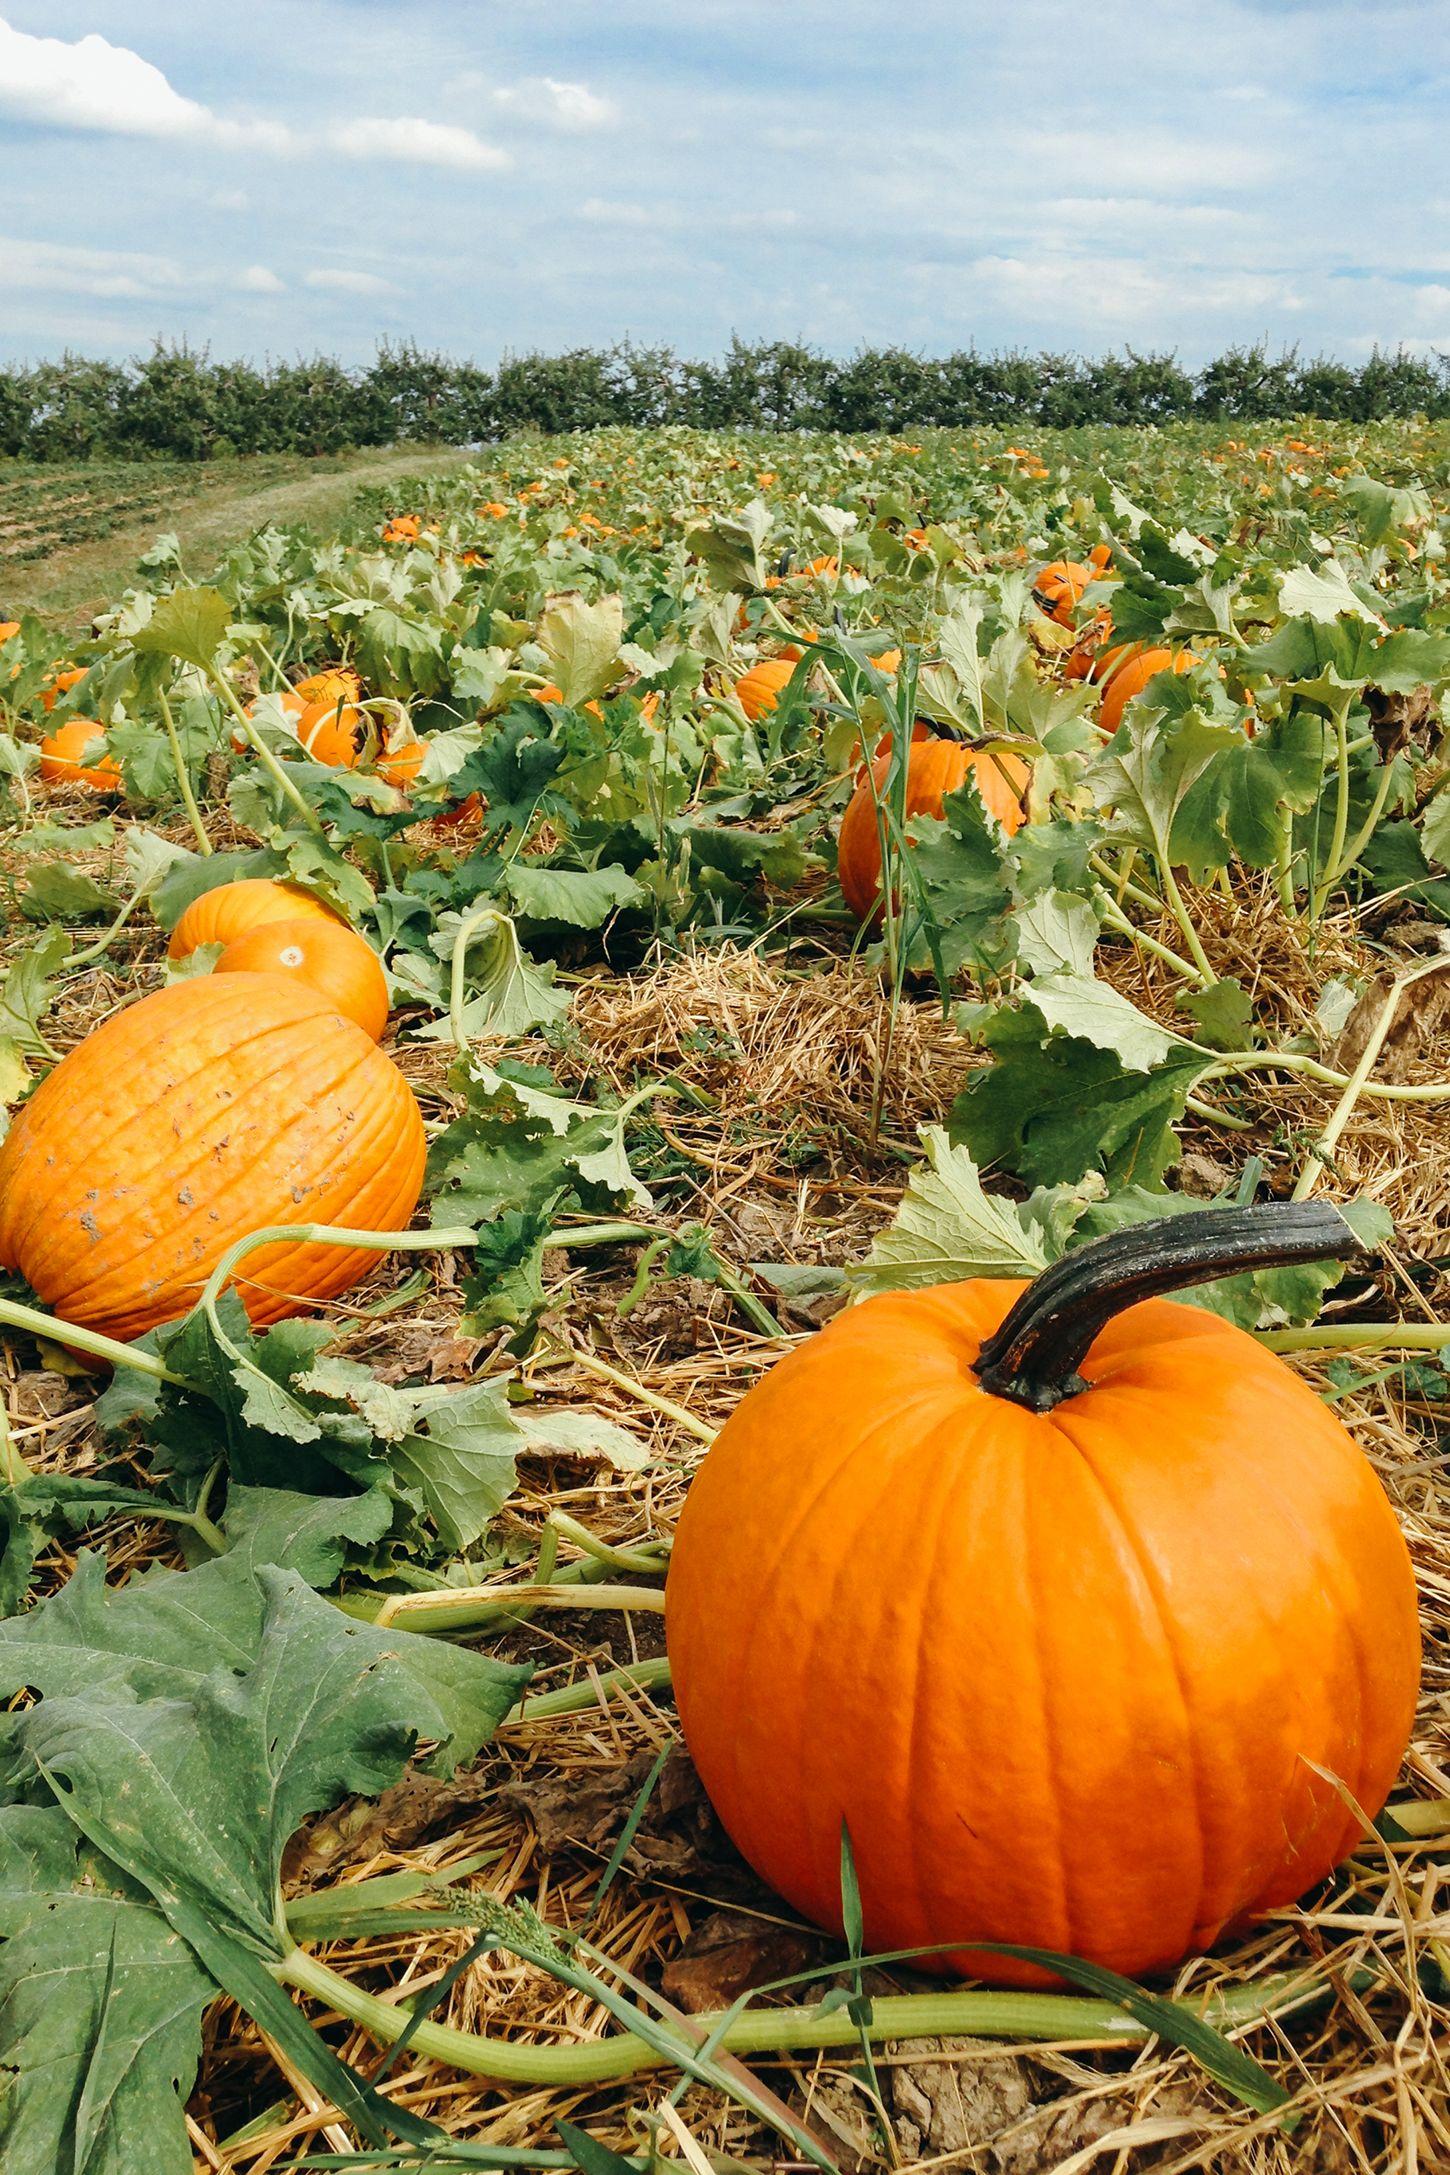 mccalls pumpkin patch - pumpkin farms near me